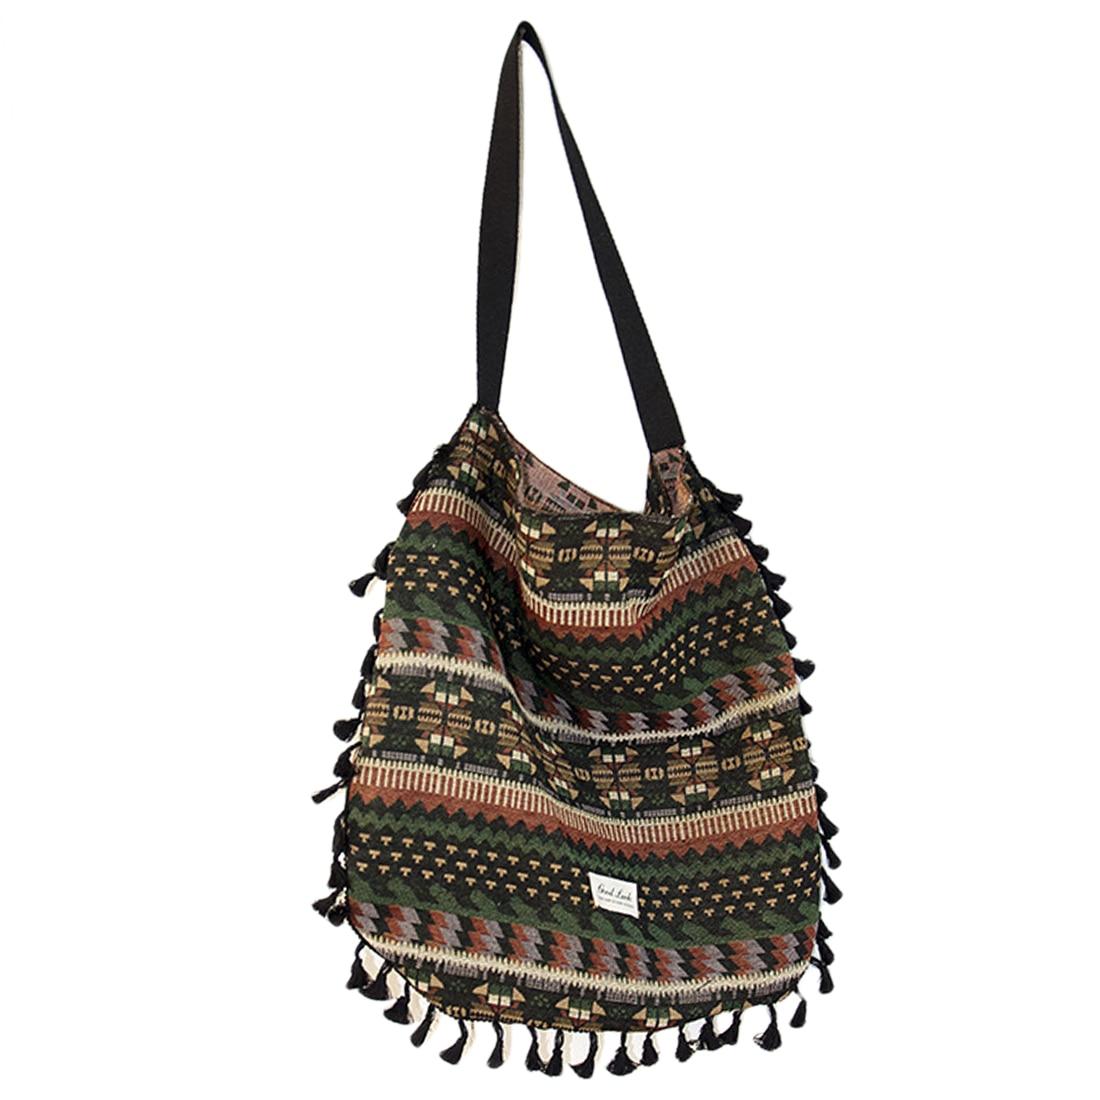 Tassel Women Shoulder Bag Vintage Ladies Handbags Bohemian Ethnic Retro Knit Woven Femanine Handbag Folk Boho Shopping Bag